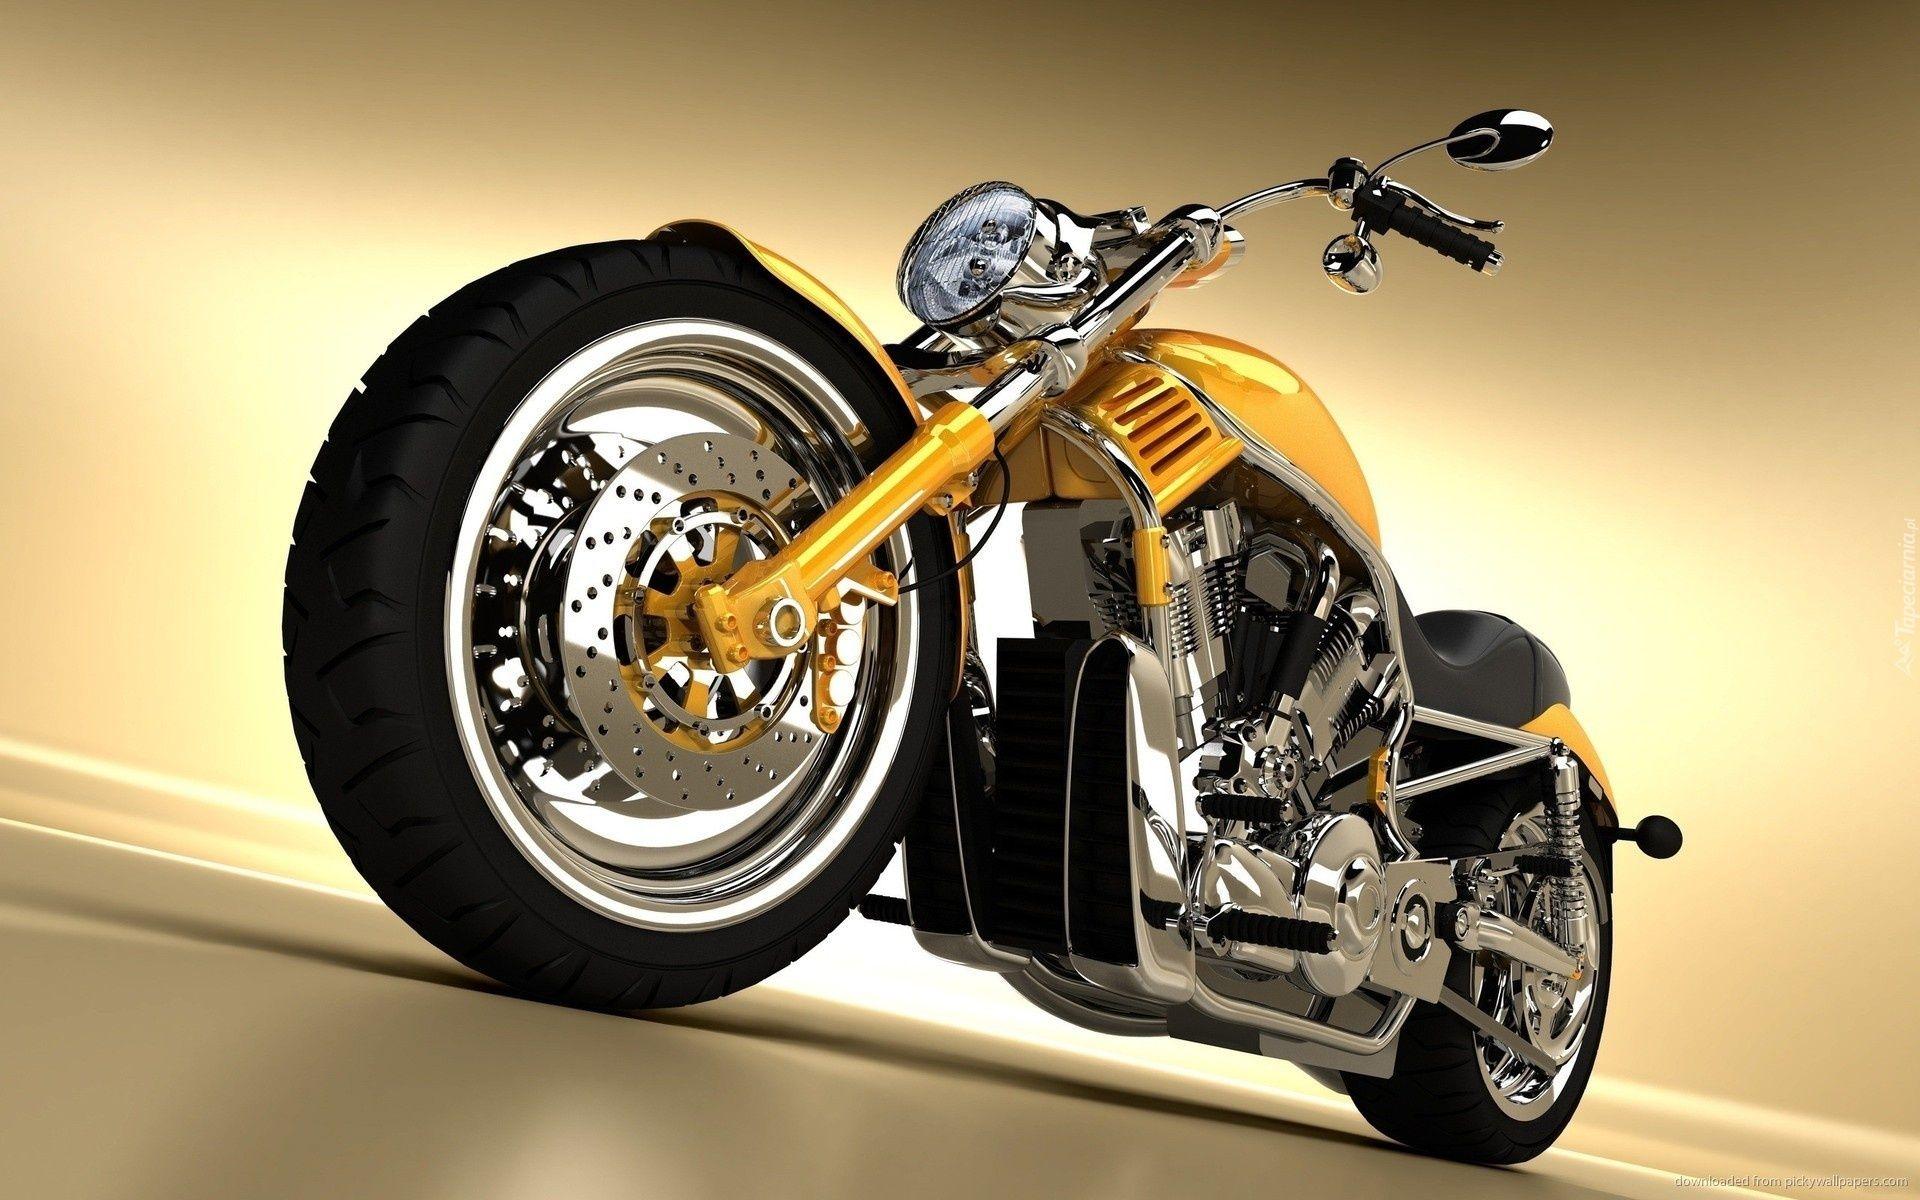 Harley Davidson Chopper Zolty Motocykl Motocykle Harley